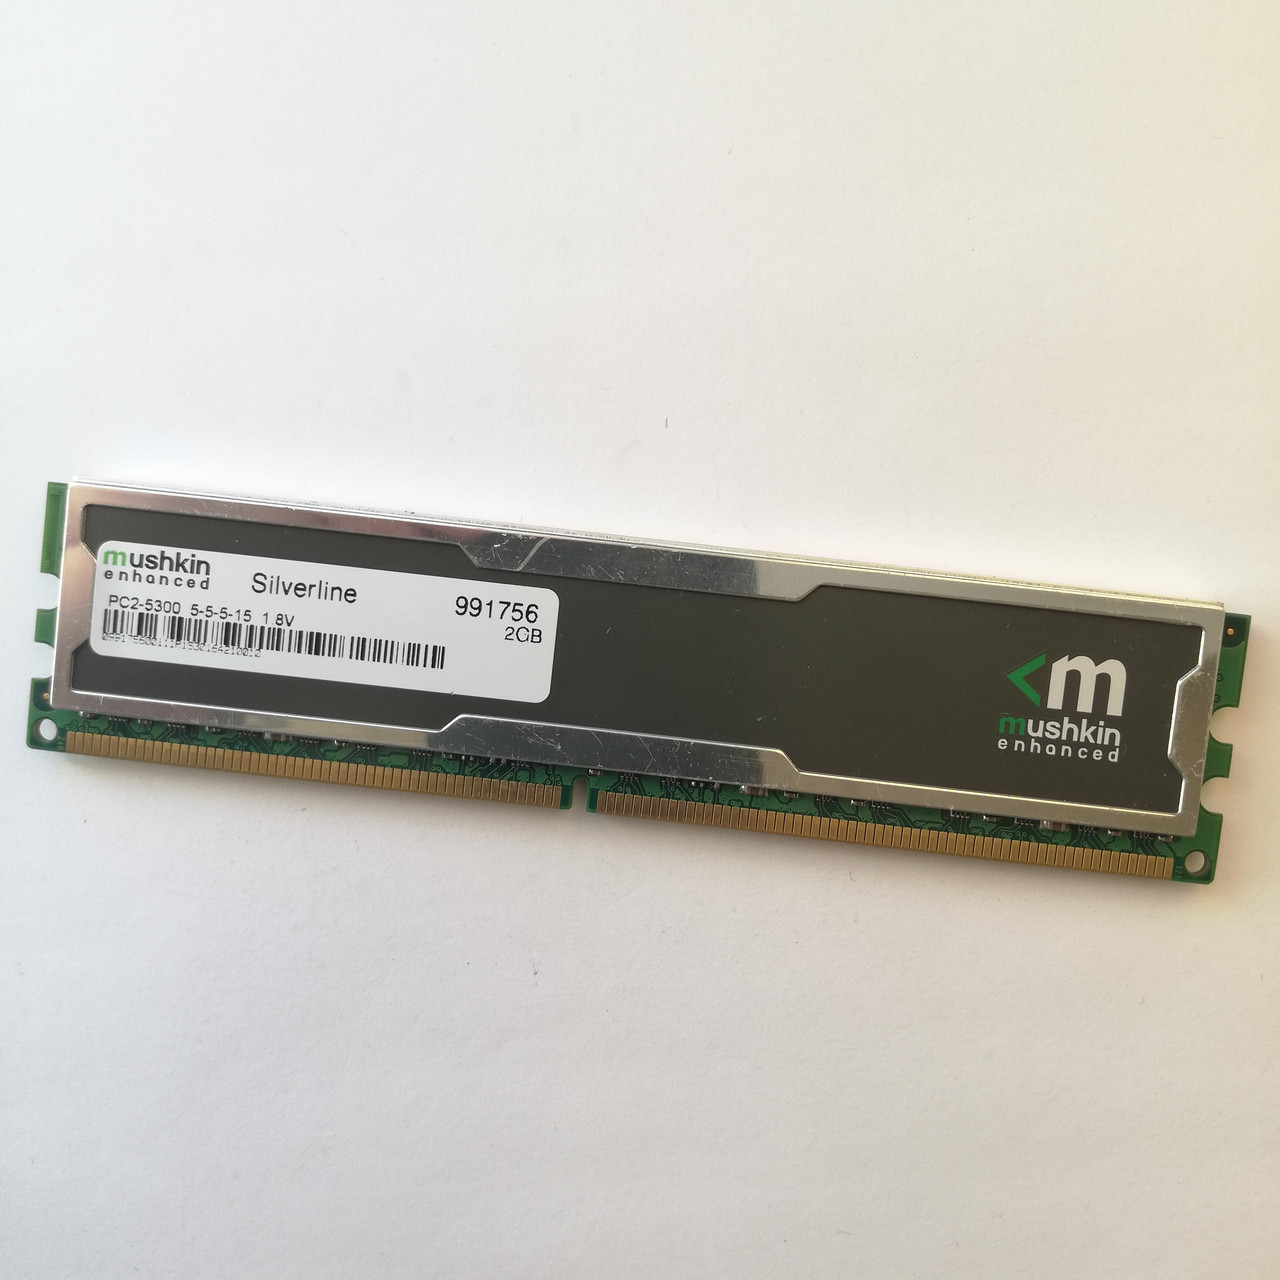 Игровая оперативная память Mushkin DDR2 2Gb 667MHz PC2 5300U CL5 (991756) Б/У